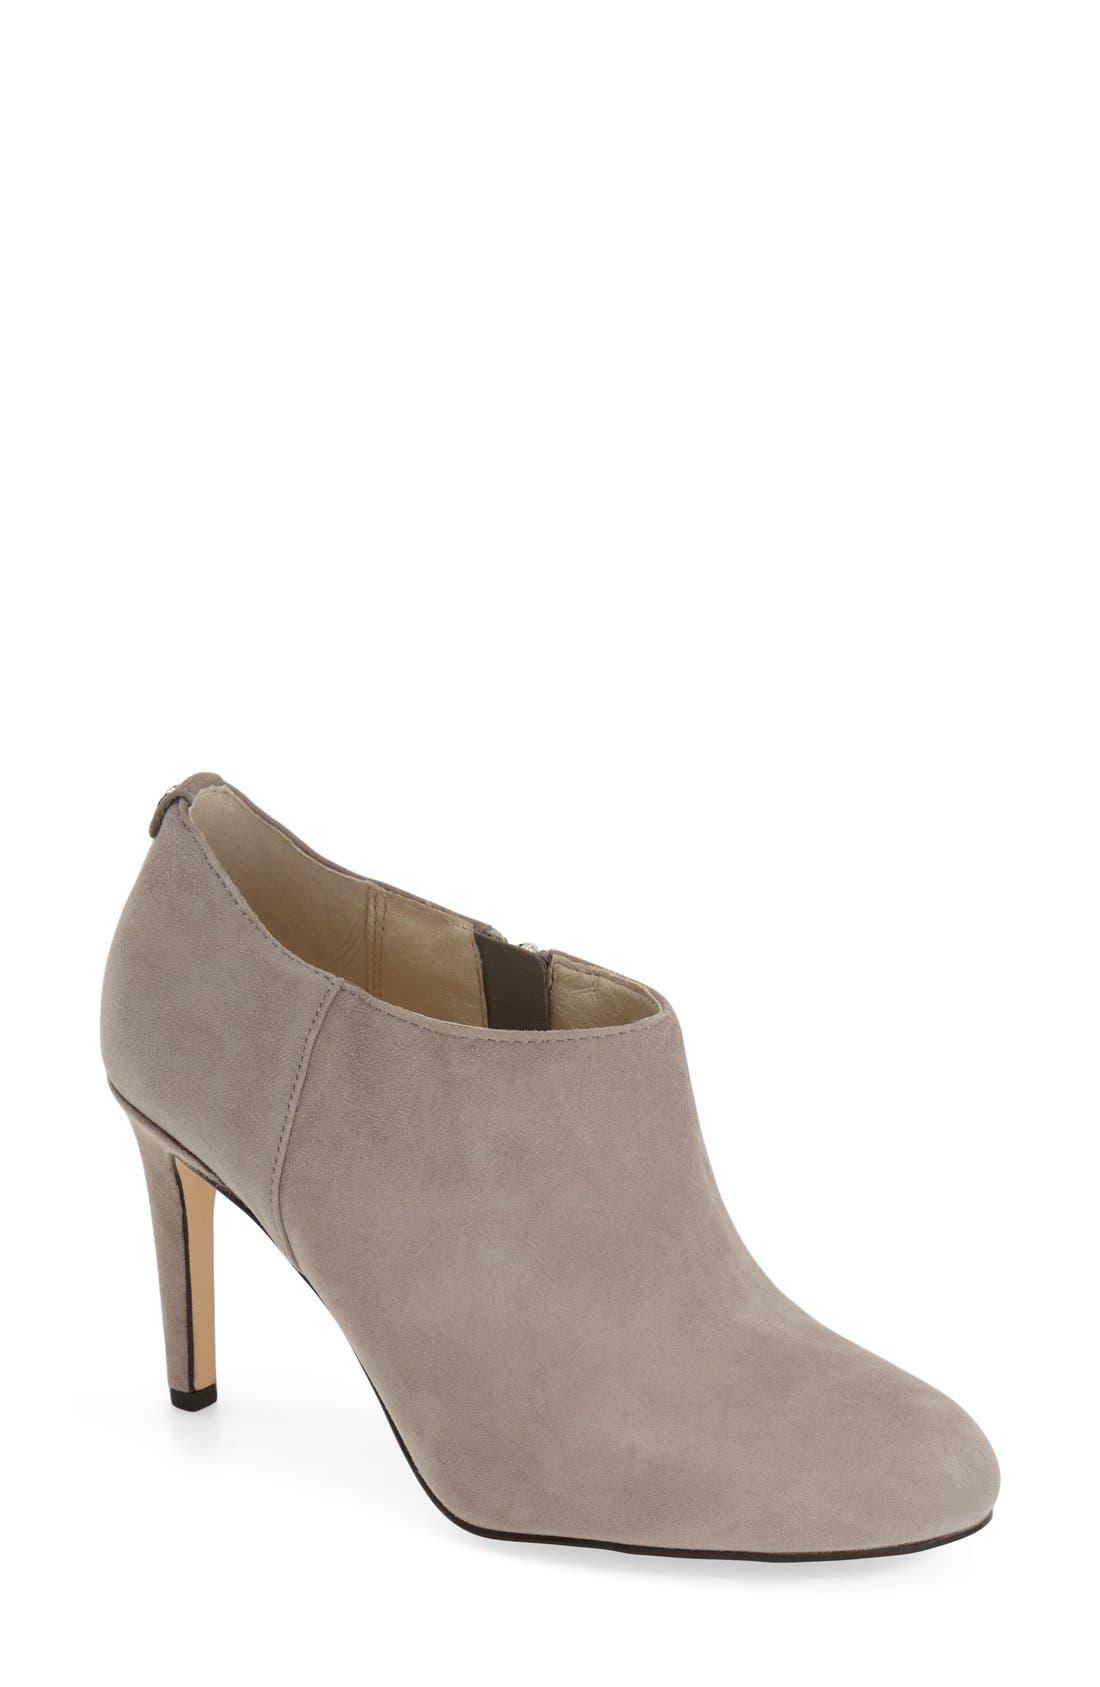 Alternate Image 1 Selected - MICHAEL Michael Kors 'Sammy' Ankle Boot (Women)